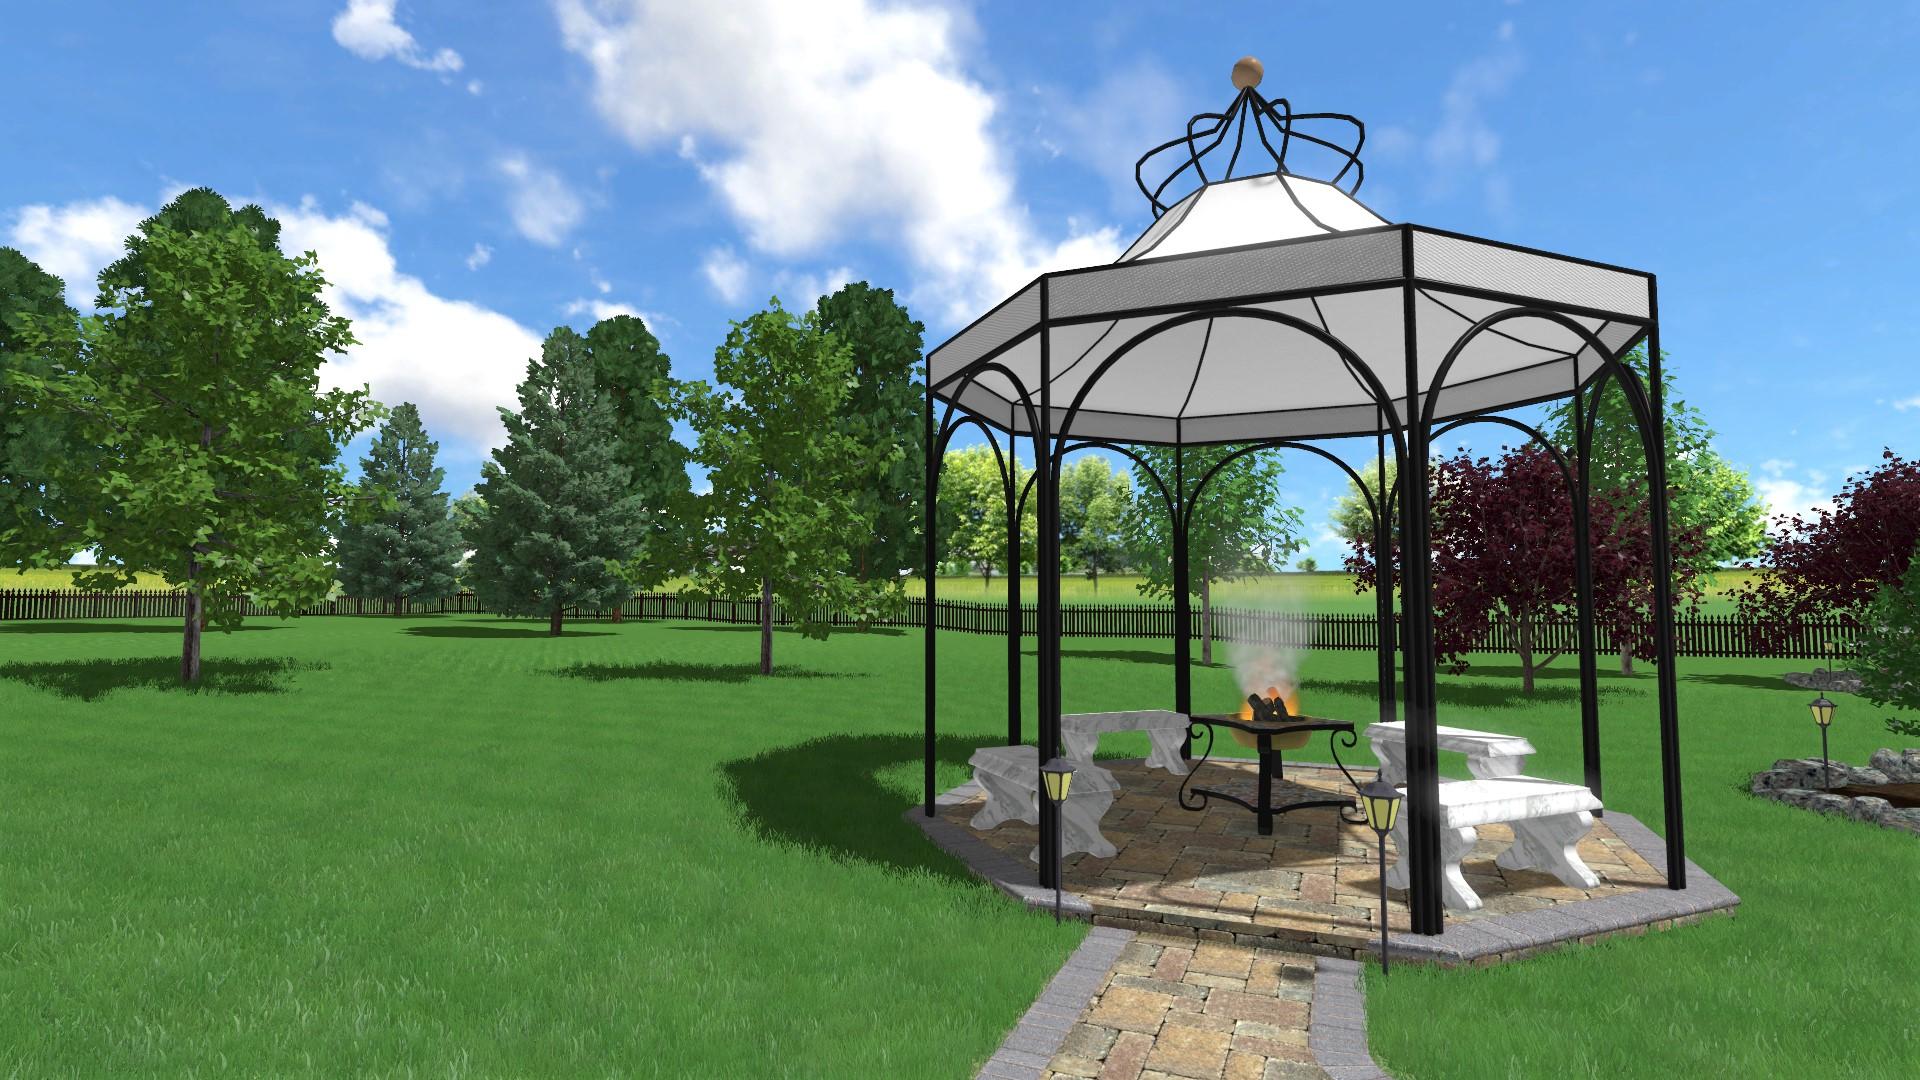 Front Landscape Design With A Small Gazebo: Landscape Design Software Gallery